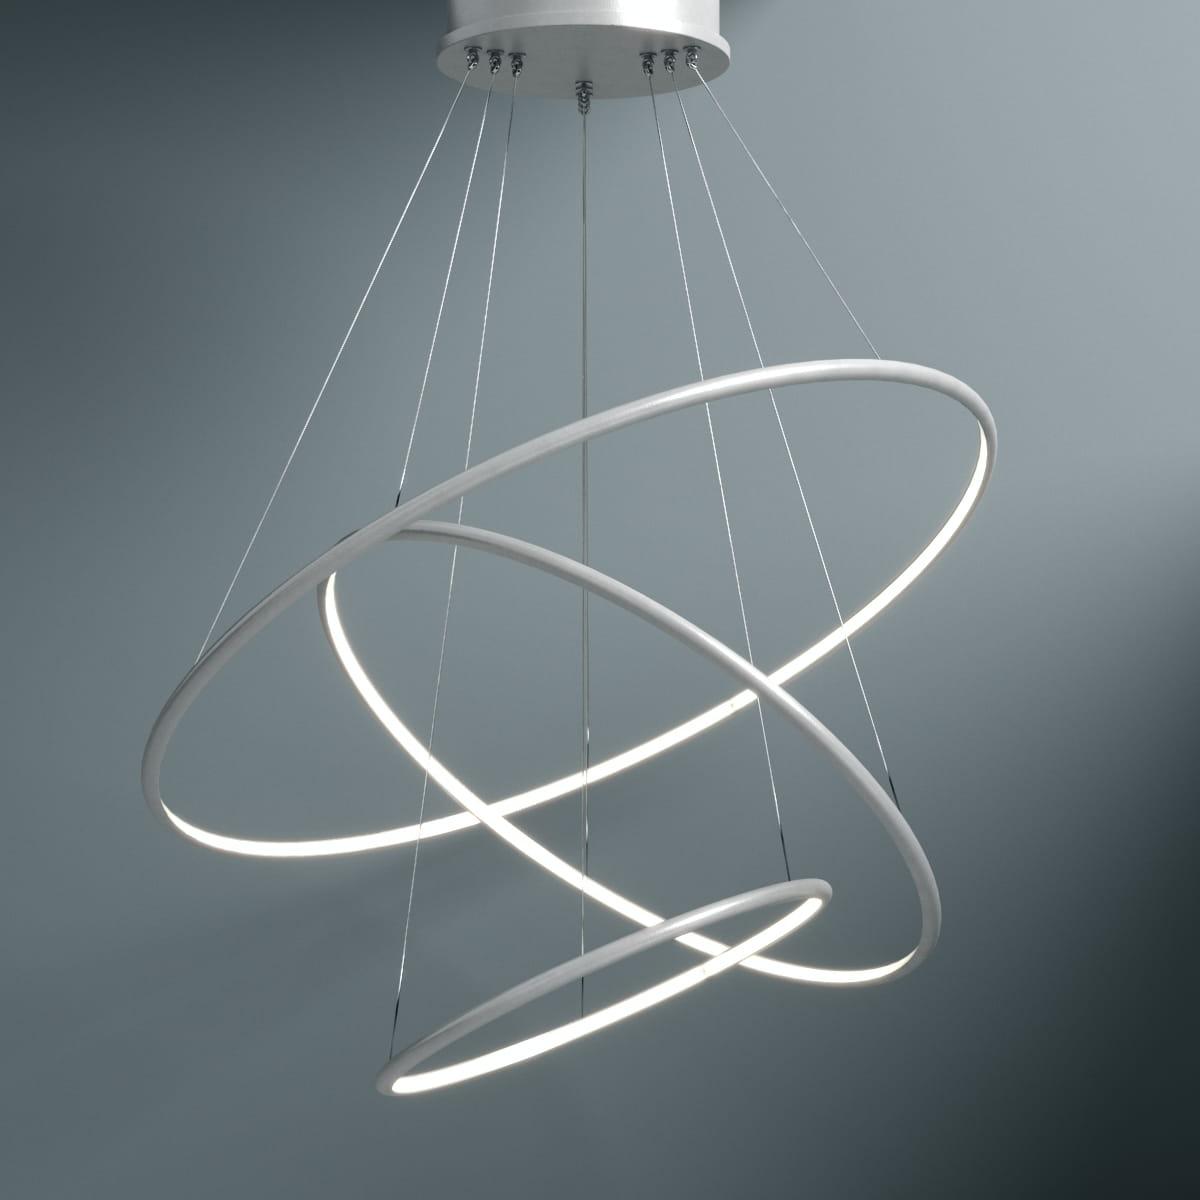 lamp 36 AM247